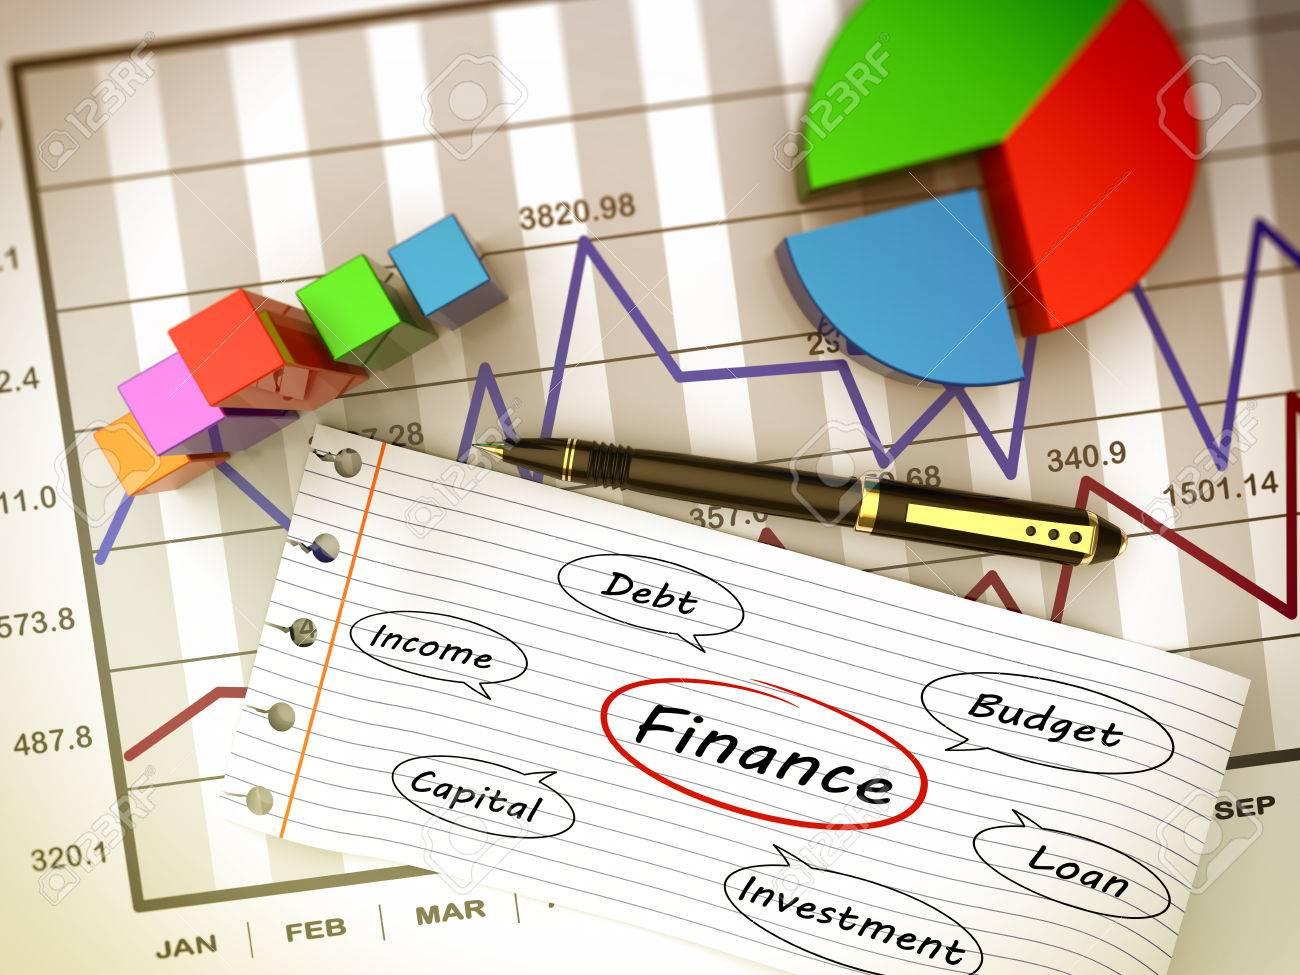 Financial business chart and economic development - 35052218